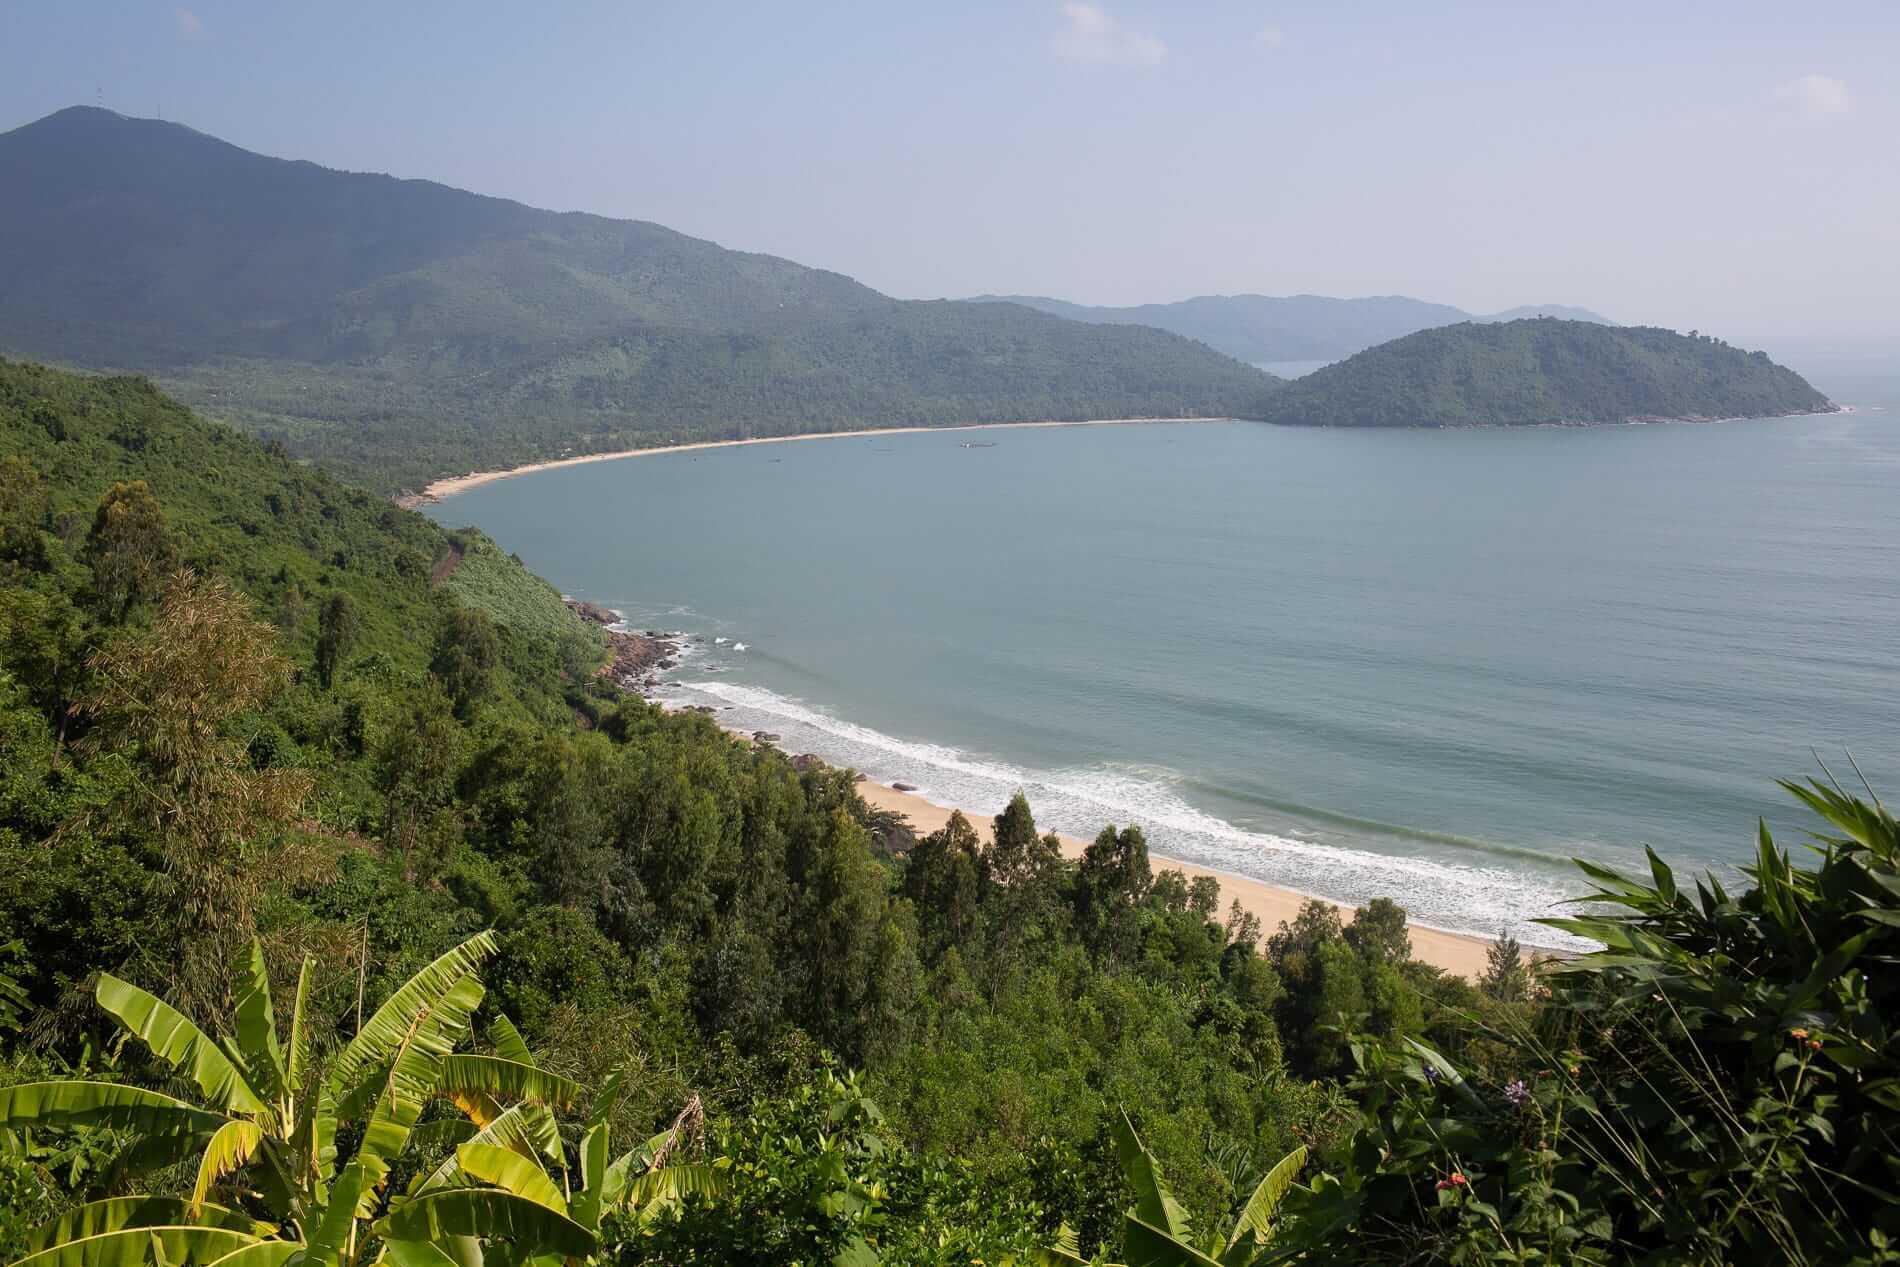 secluded beaches in Da Nang along the Hai Van Pass